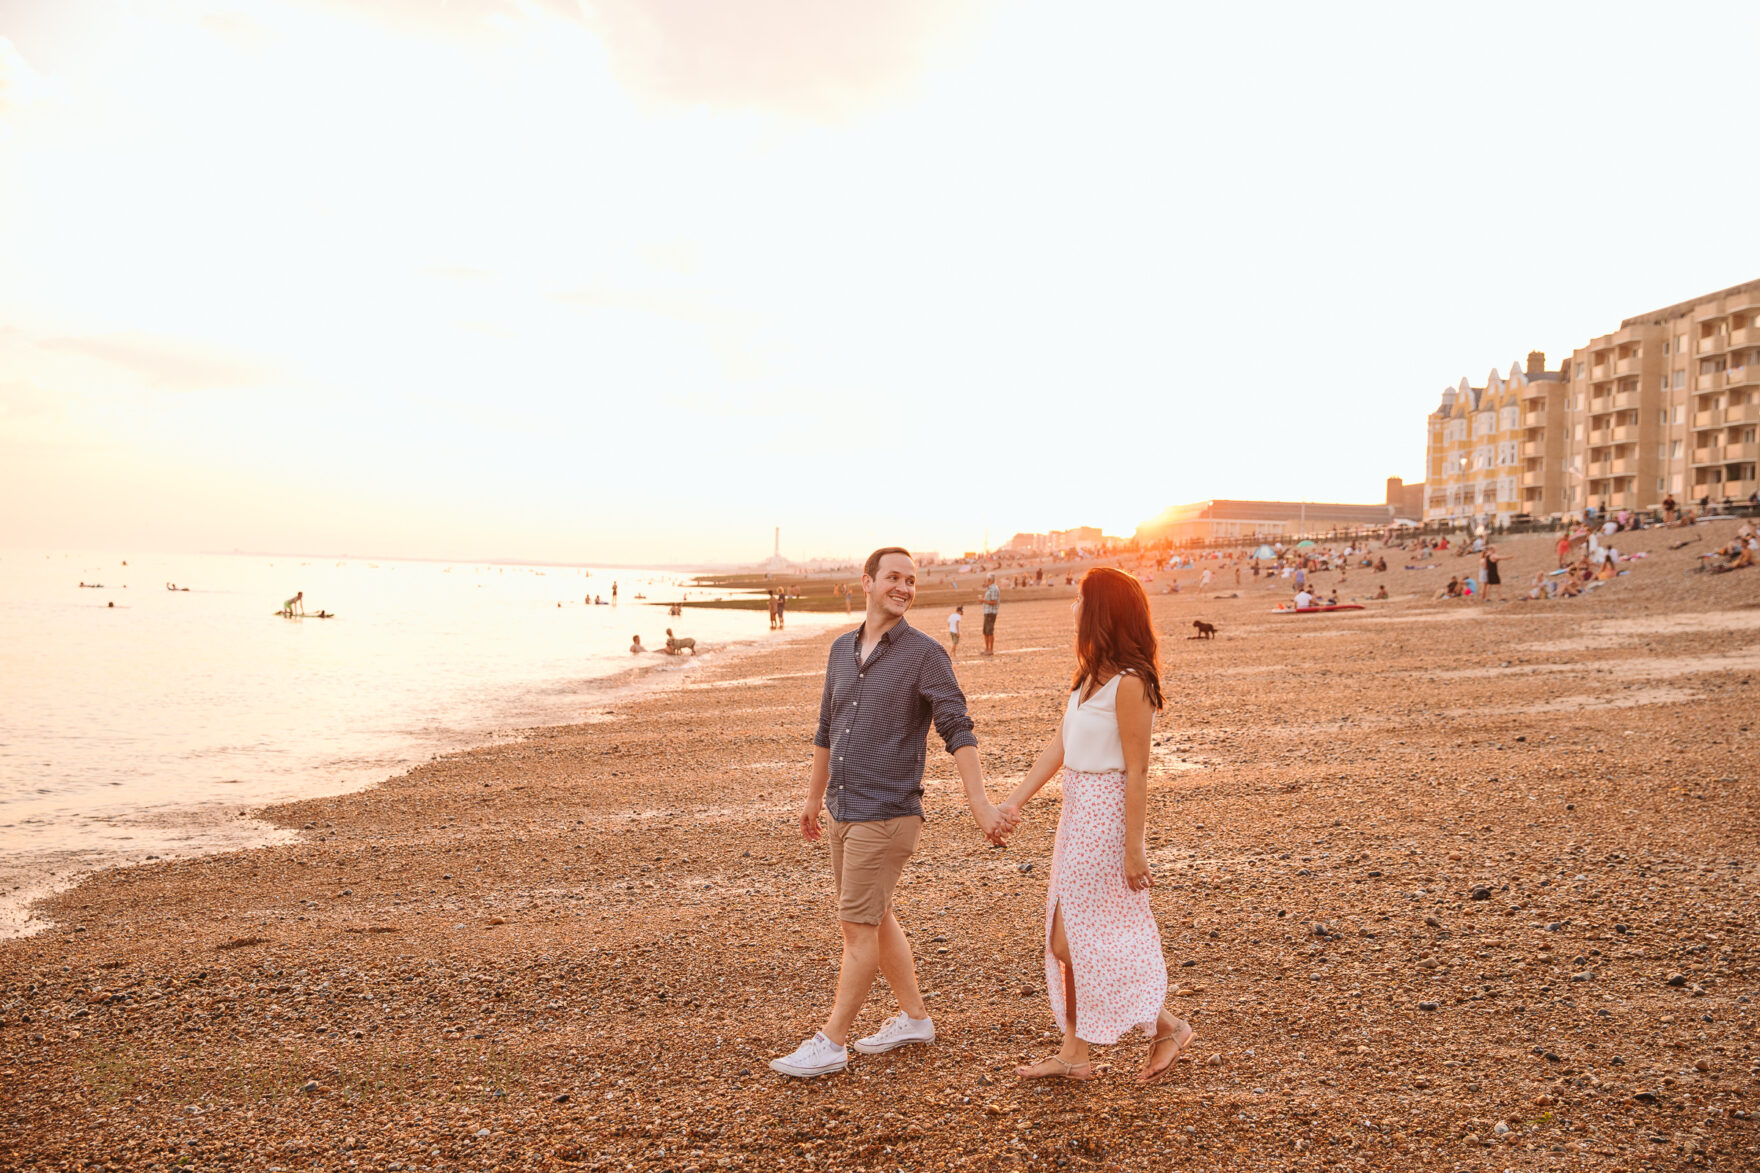 golden hour negagment photos from Brighton Beach